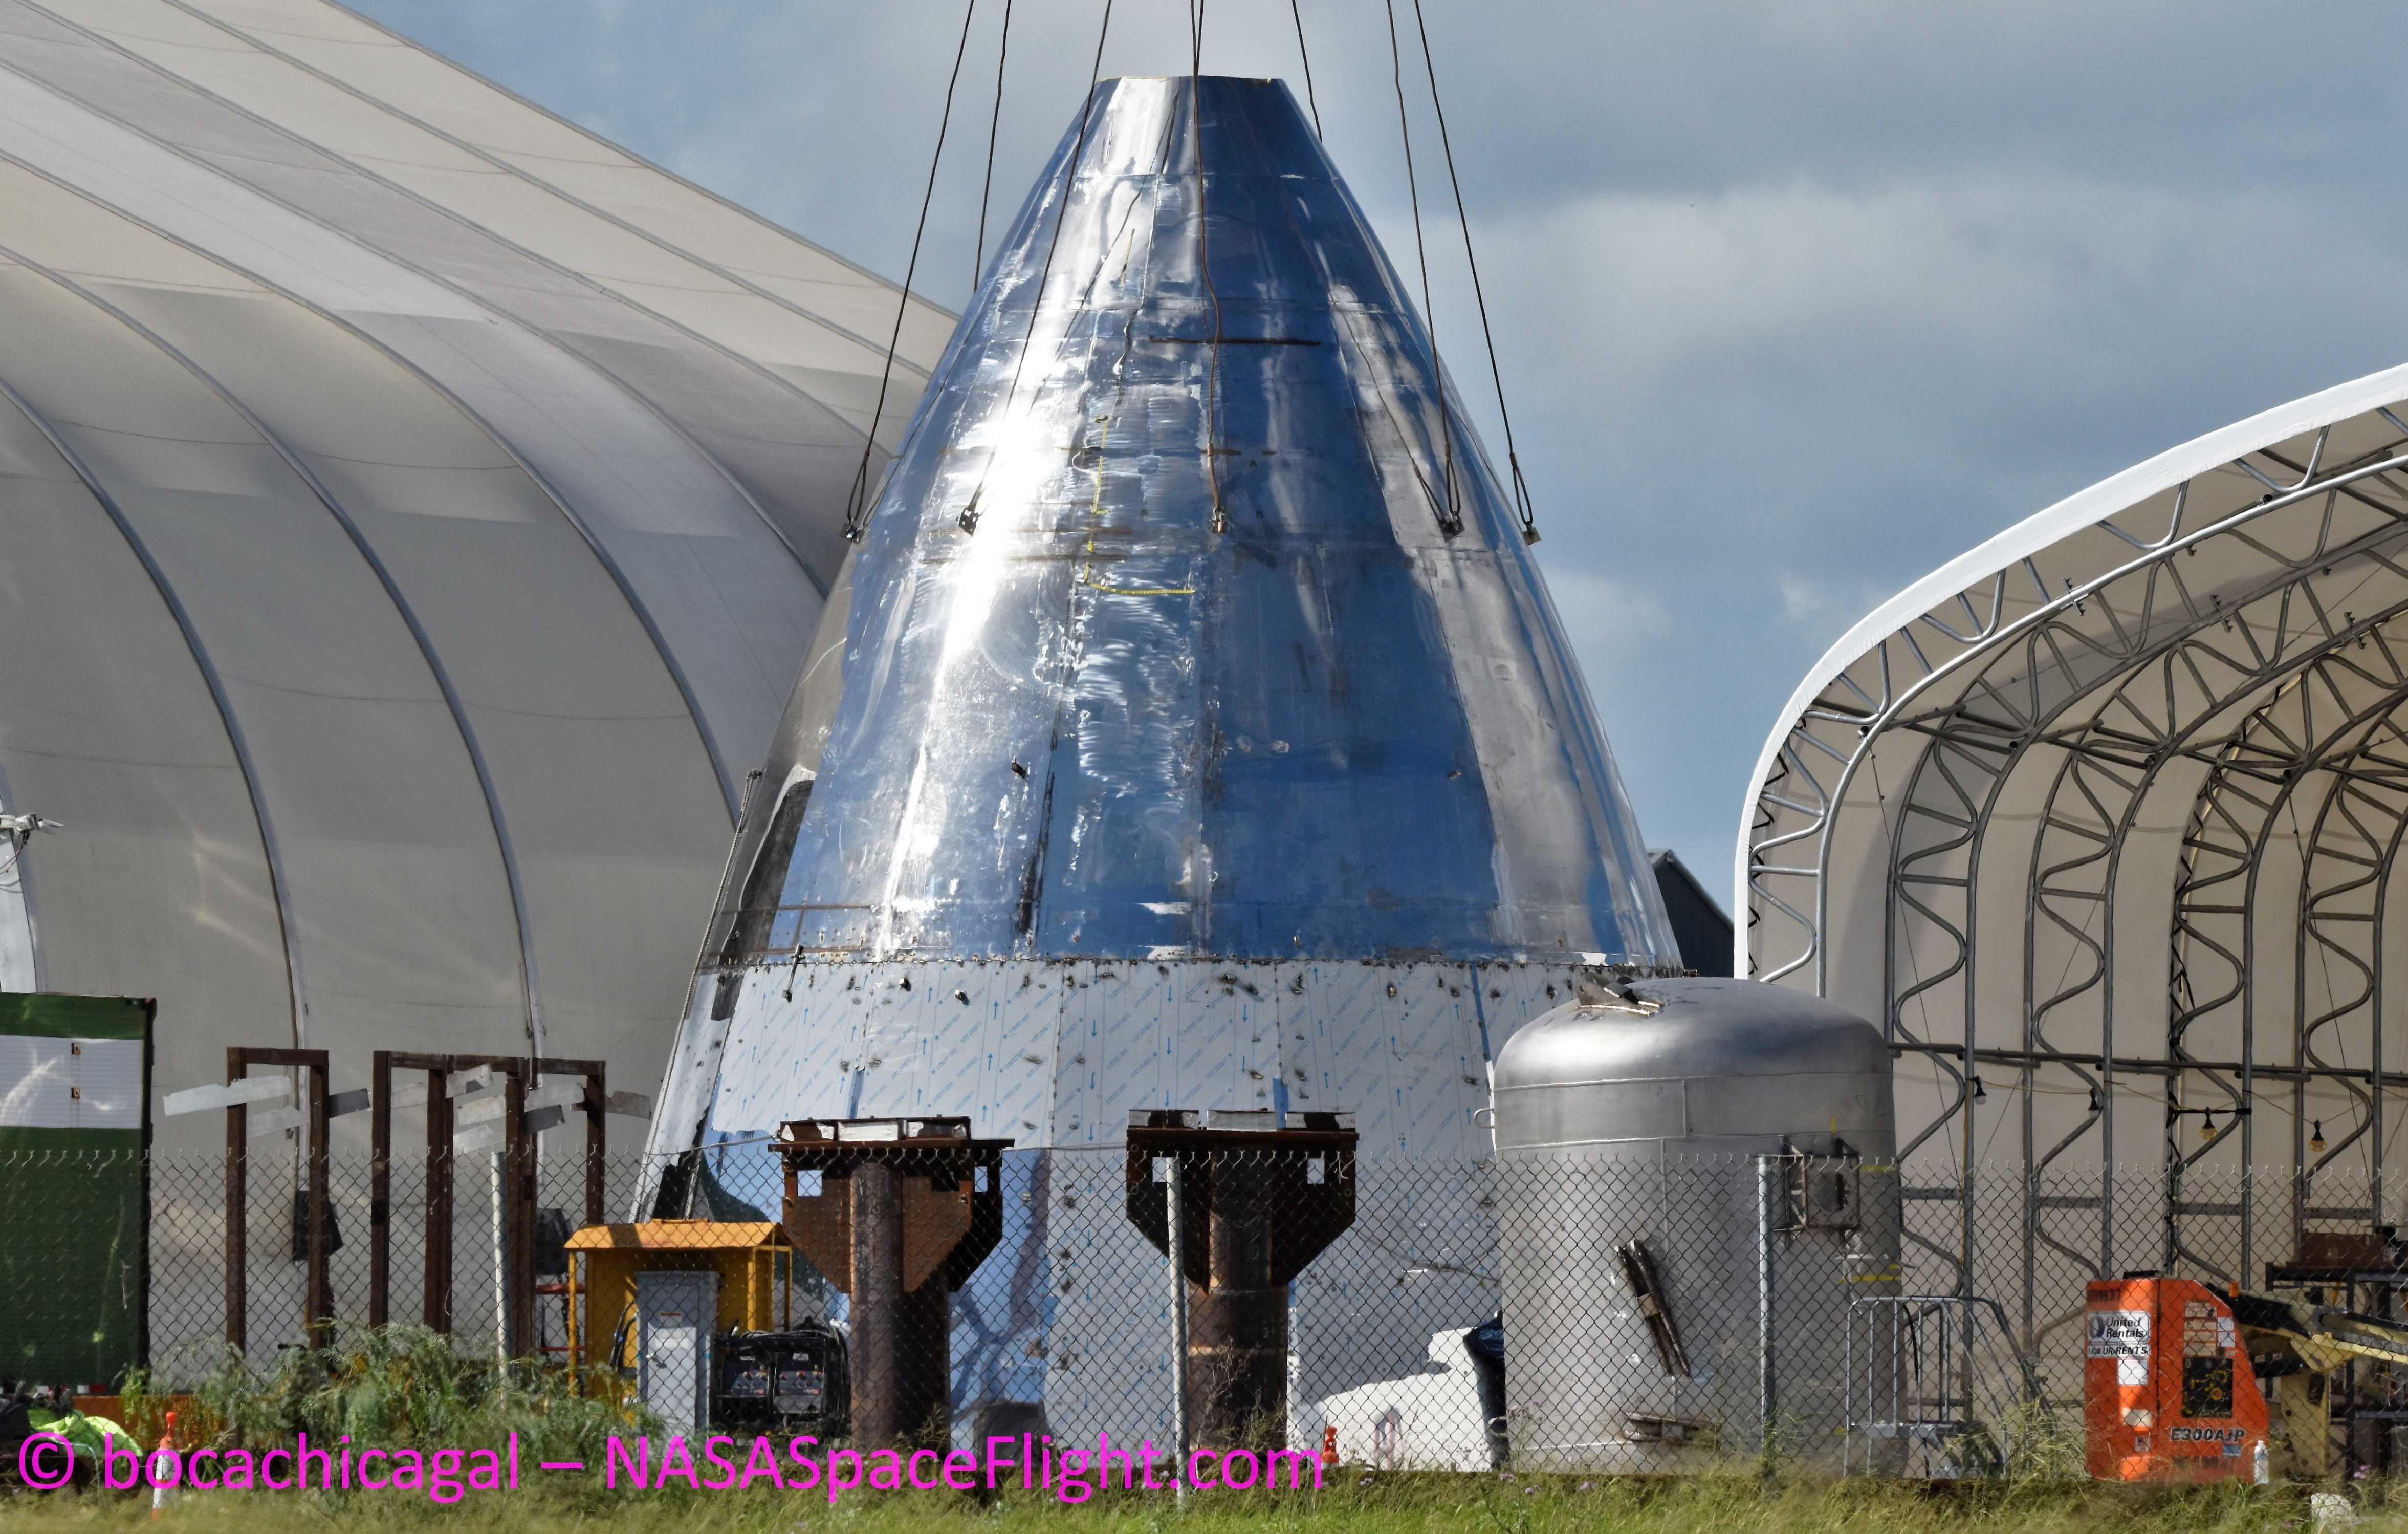 Boca Chica Starship Mk1 092219 (NASASpaceflight – bocachicagal) header & nose 1 (c)